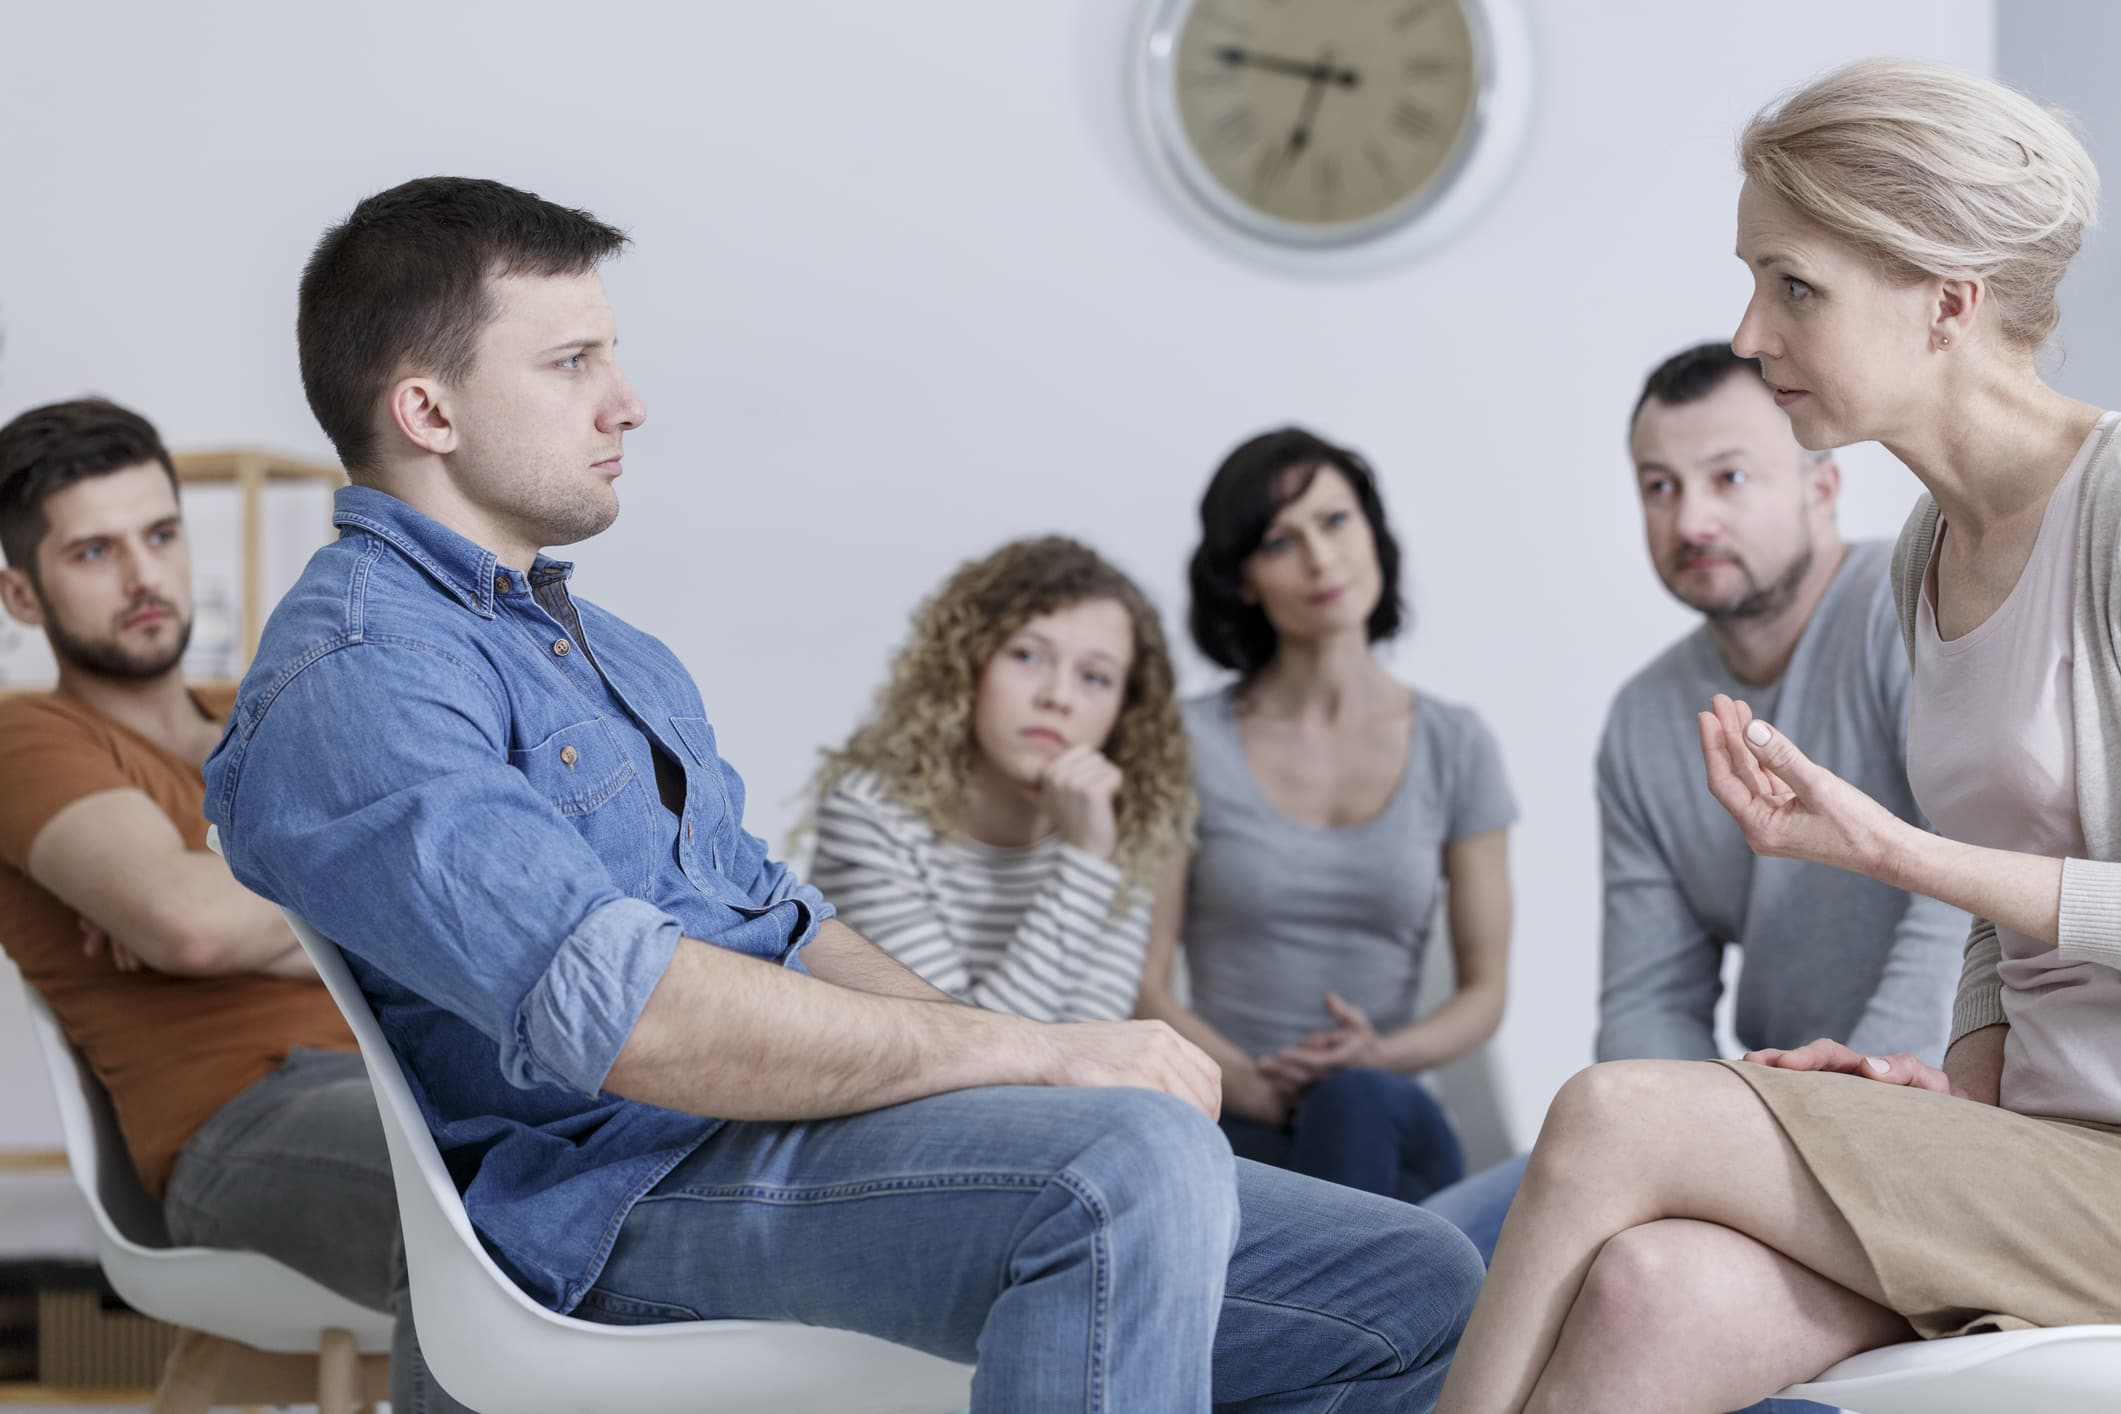 people-in-addiction-treatment-program